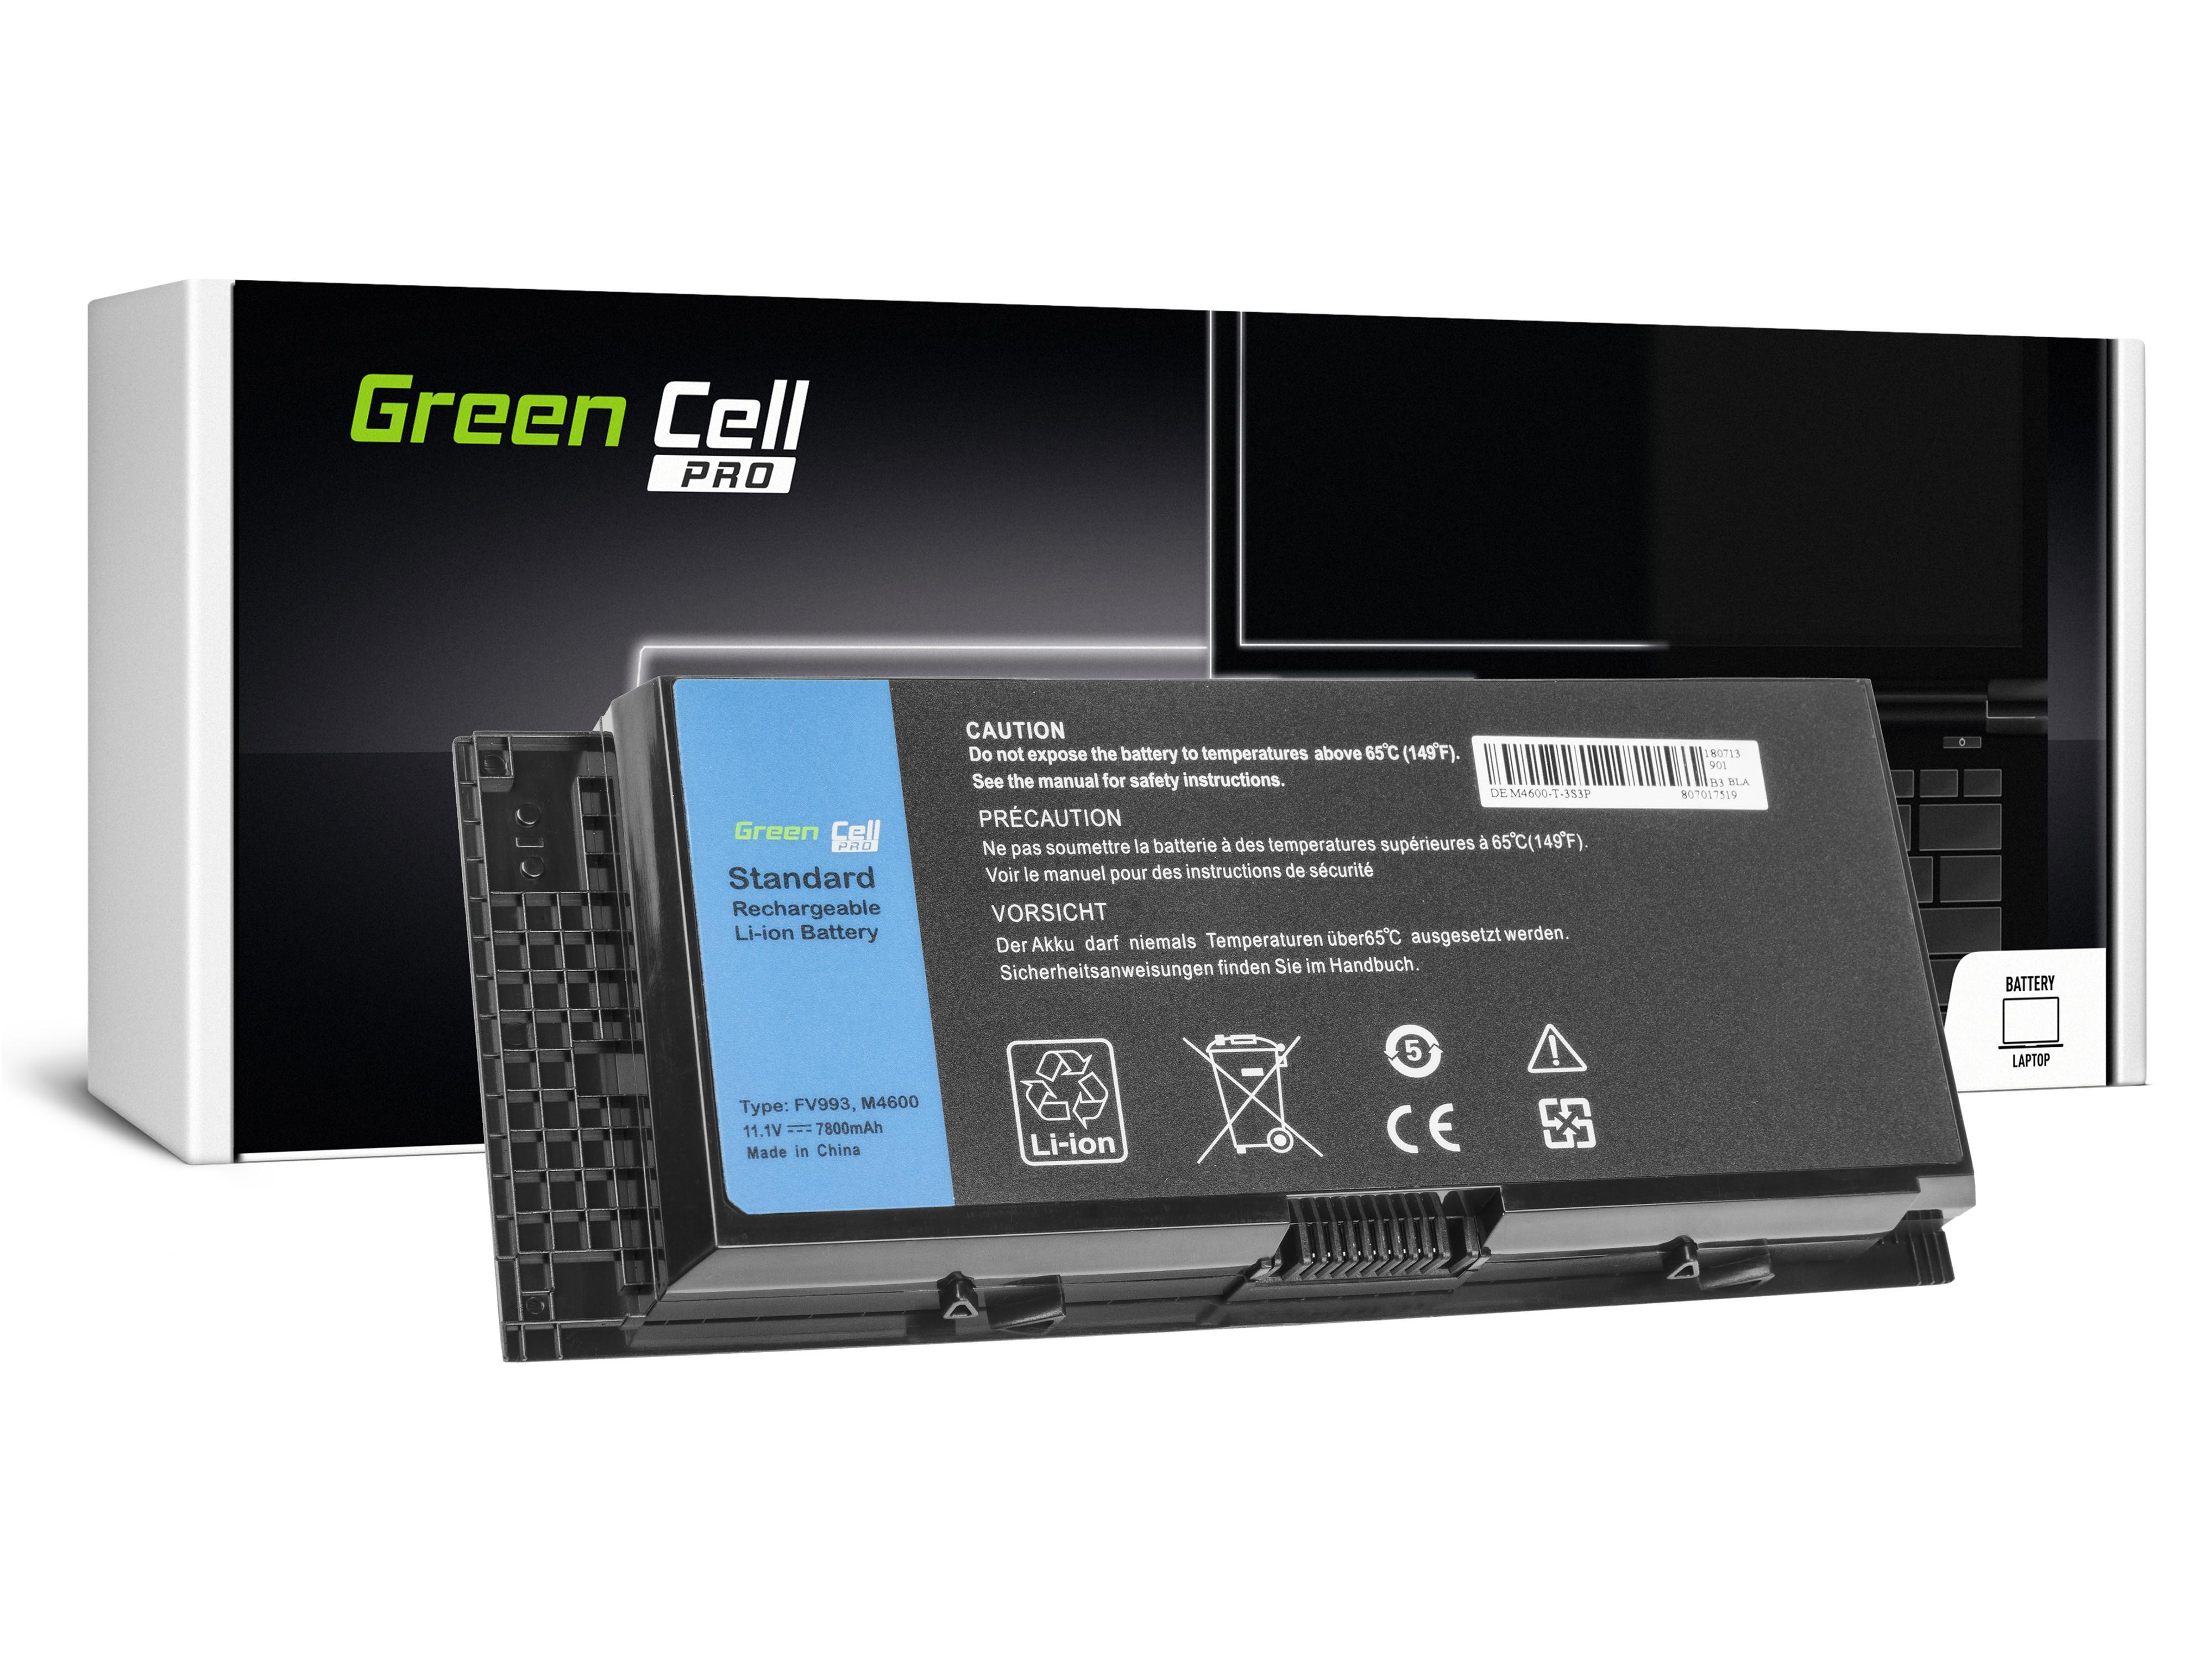 Green Cell DE74PRO Baterie Dell FV993 Dell Precision M4600 M4700 M4800 M6600 M6700 7800mAh Li-ion - neoriginální